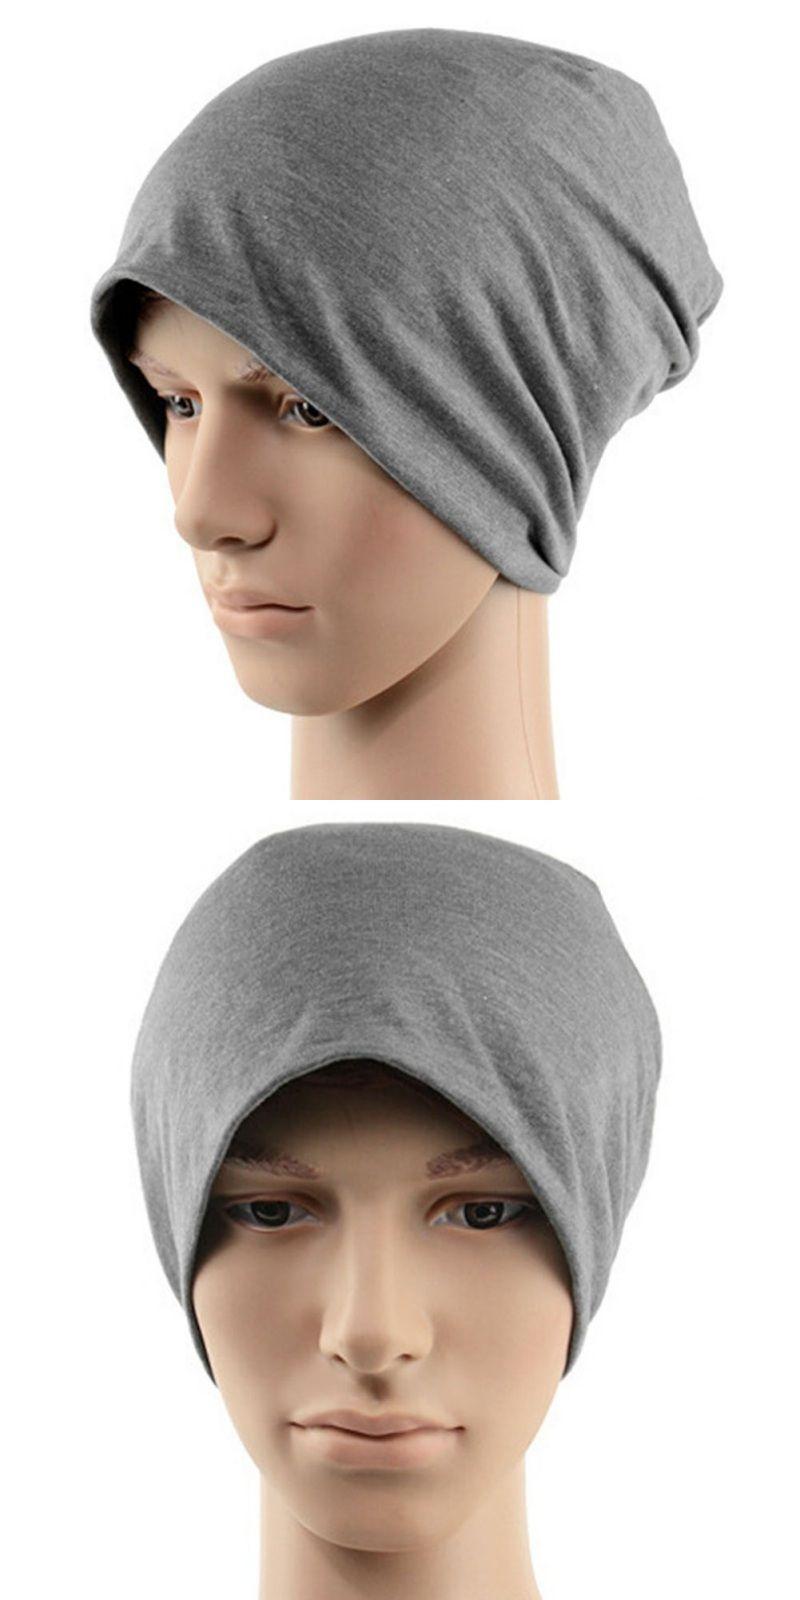 afc9ede286b 11 STYLE Winter Warm Unisex Knitted Crochet Slouchy Hat Cap for Women Men Beanies  Hip Hop